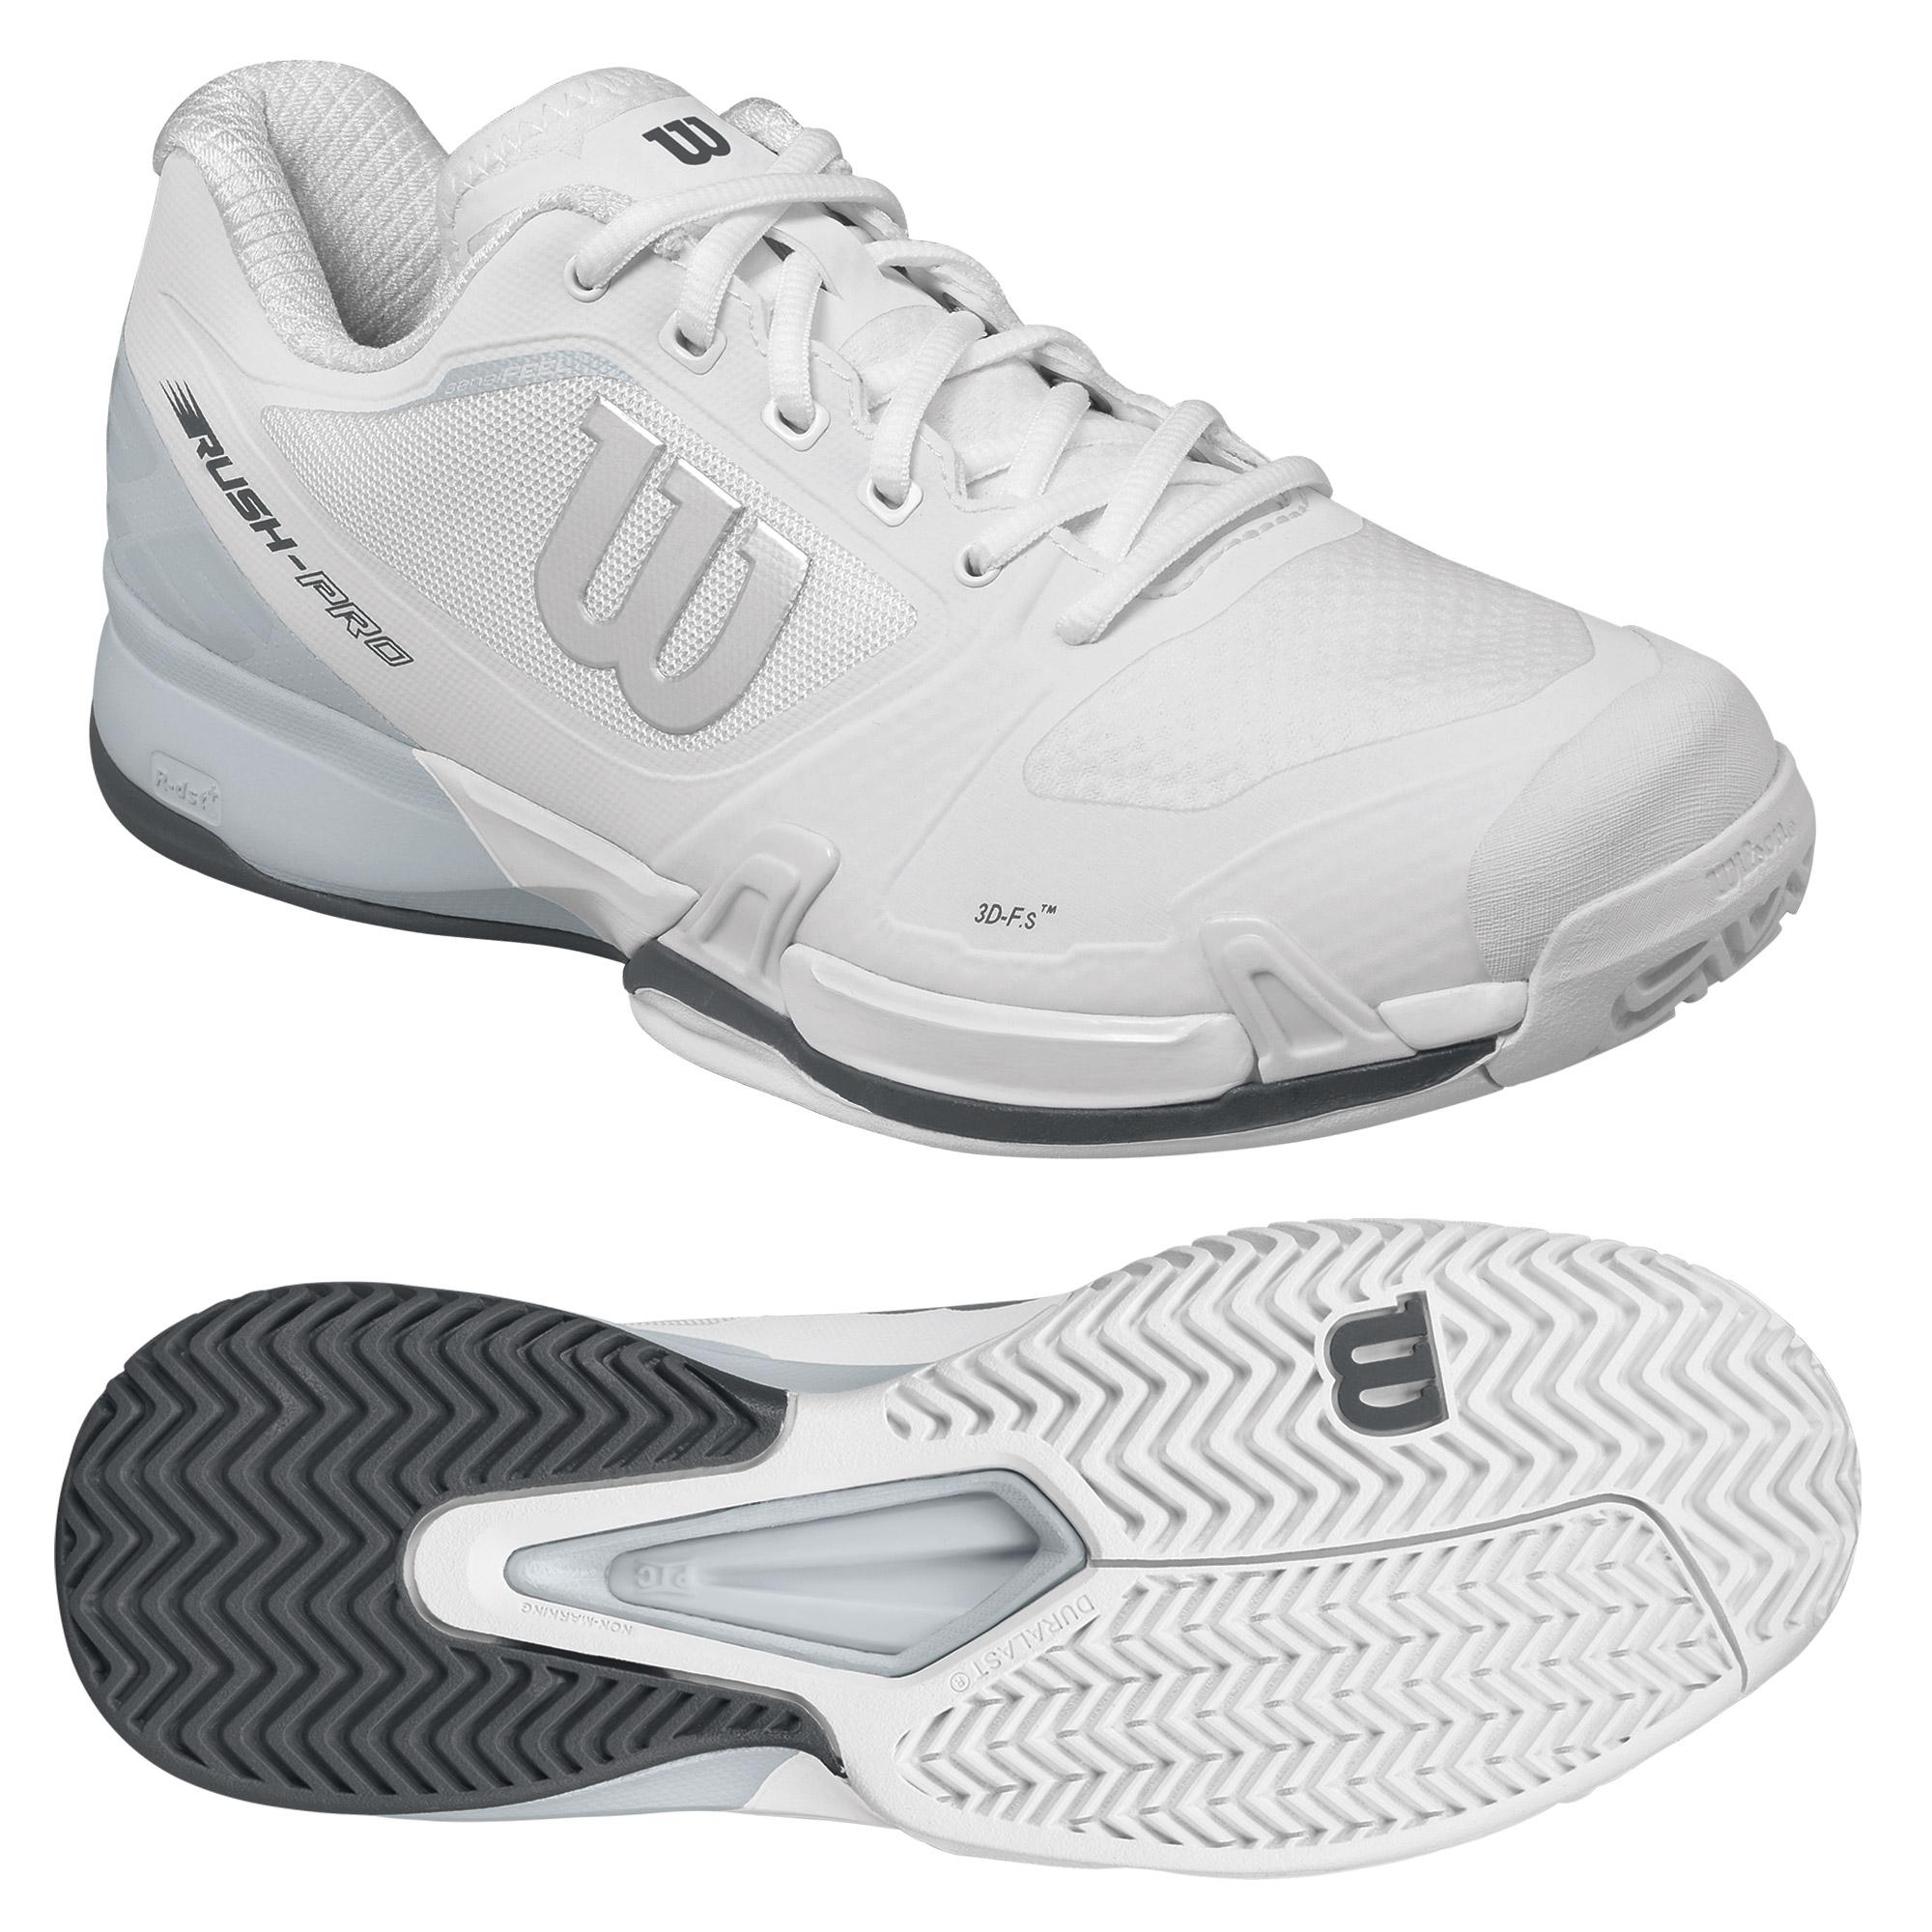 Wilson Rush Pro 2.5 Mens Tennis Shoes  WhiteGrey 10 UK